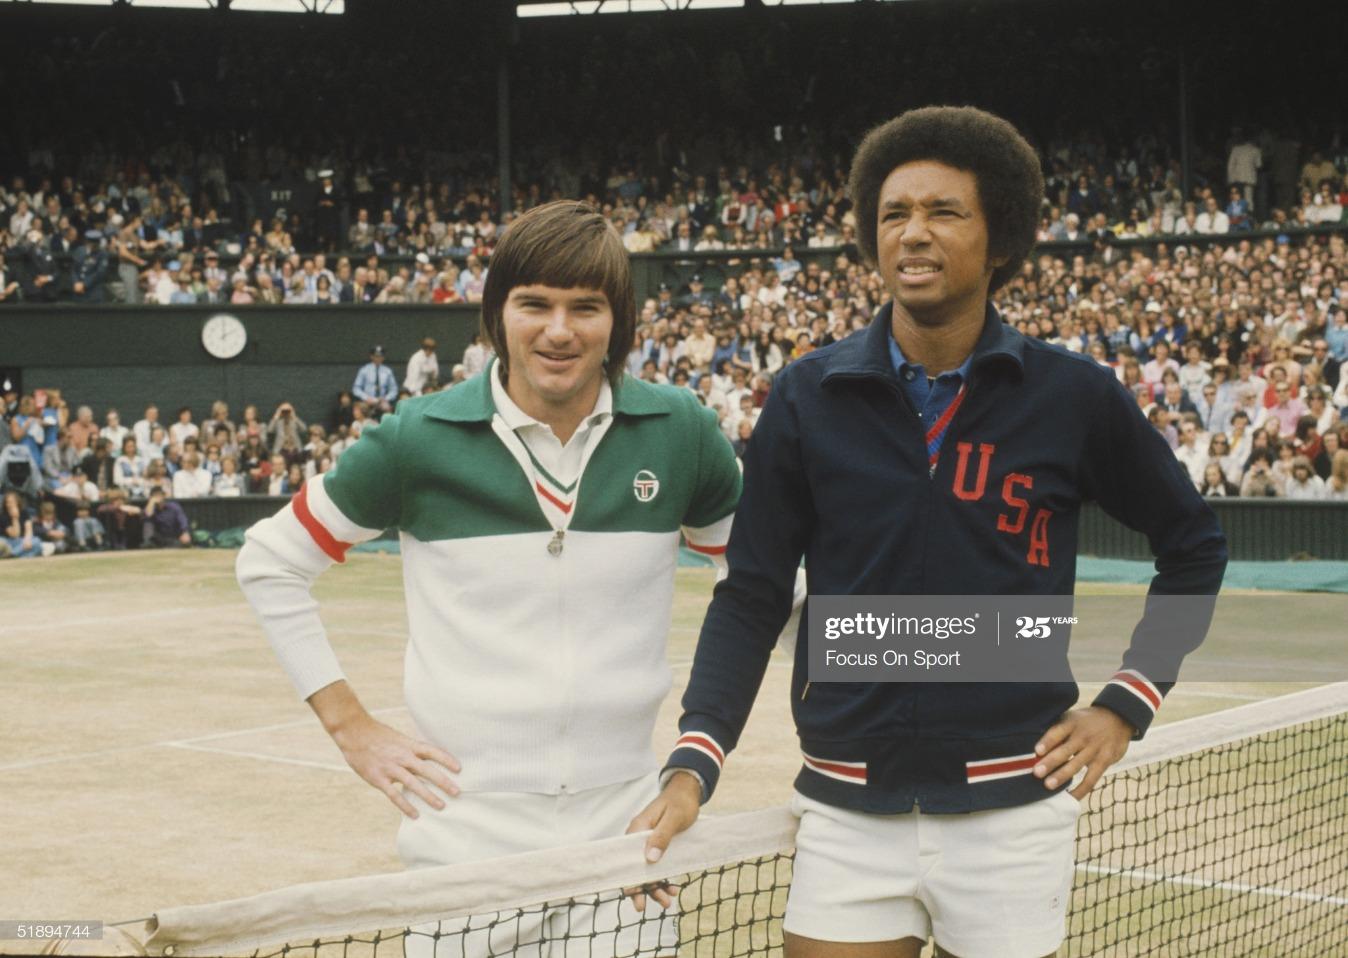 1975 Wimbledon Lawn Tennis Championship : News Photo